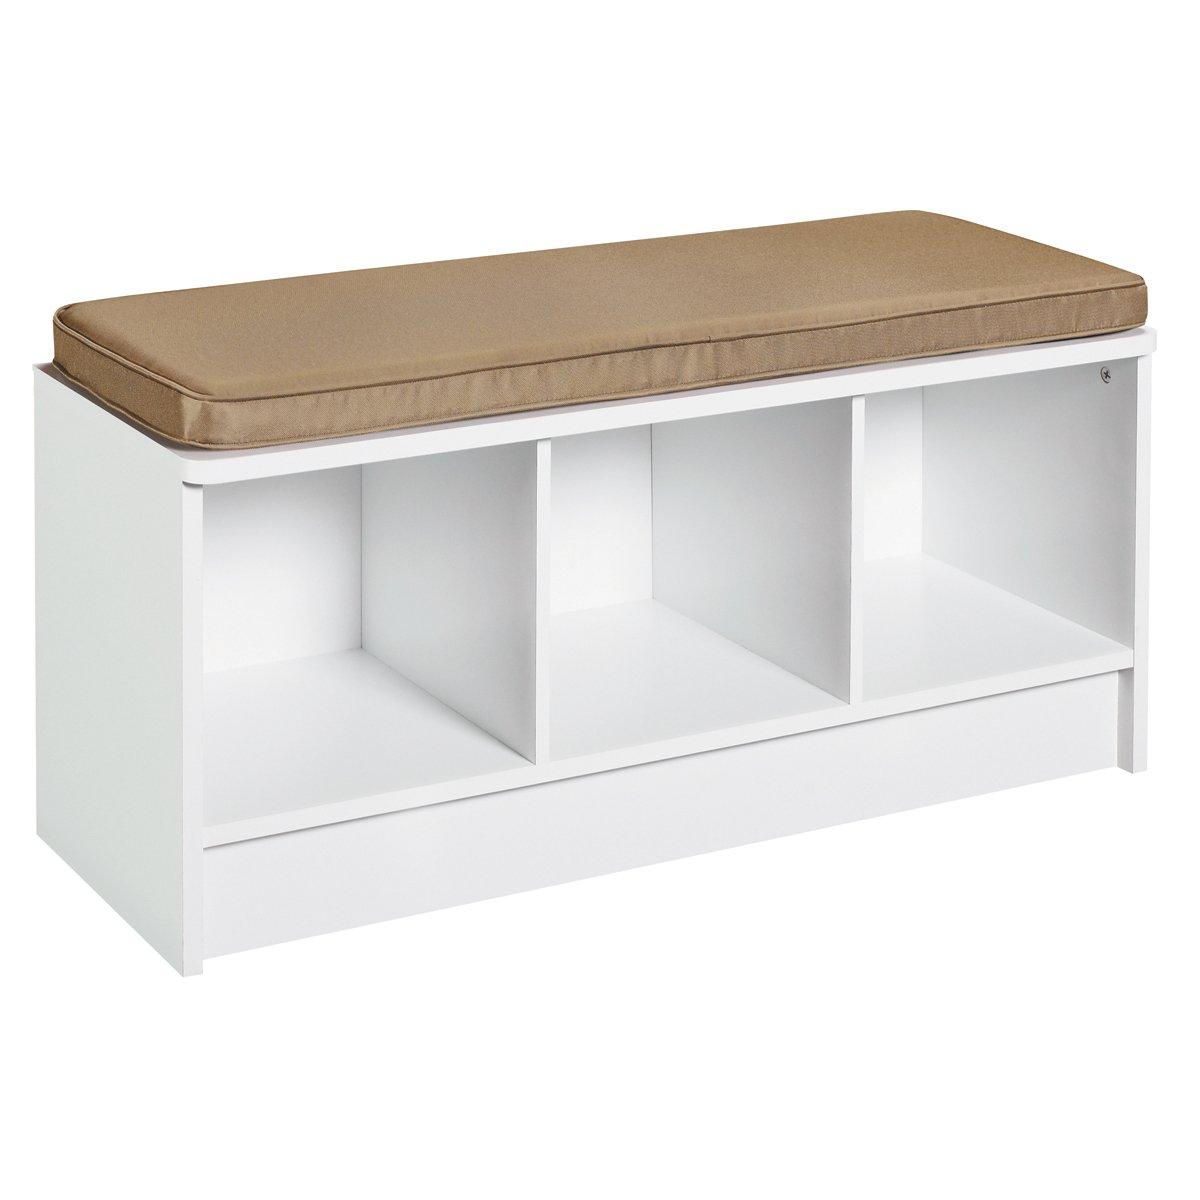 Target Storage Bench Cubbies